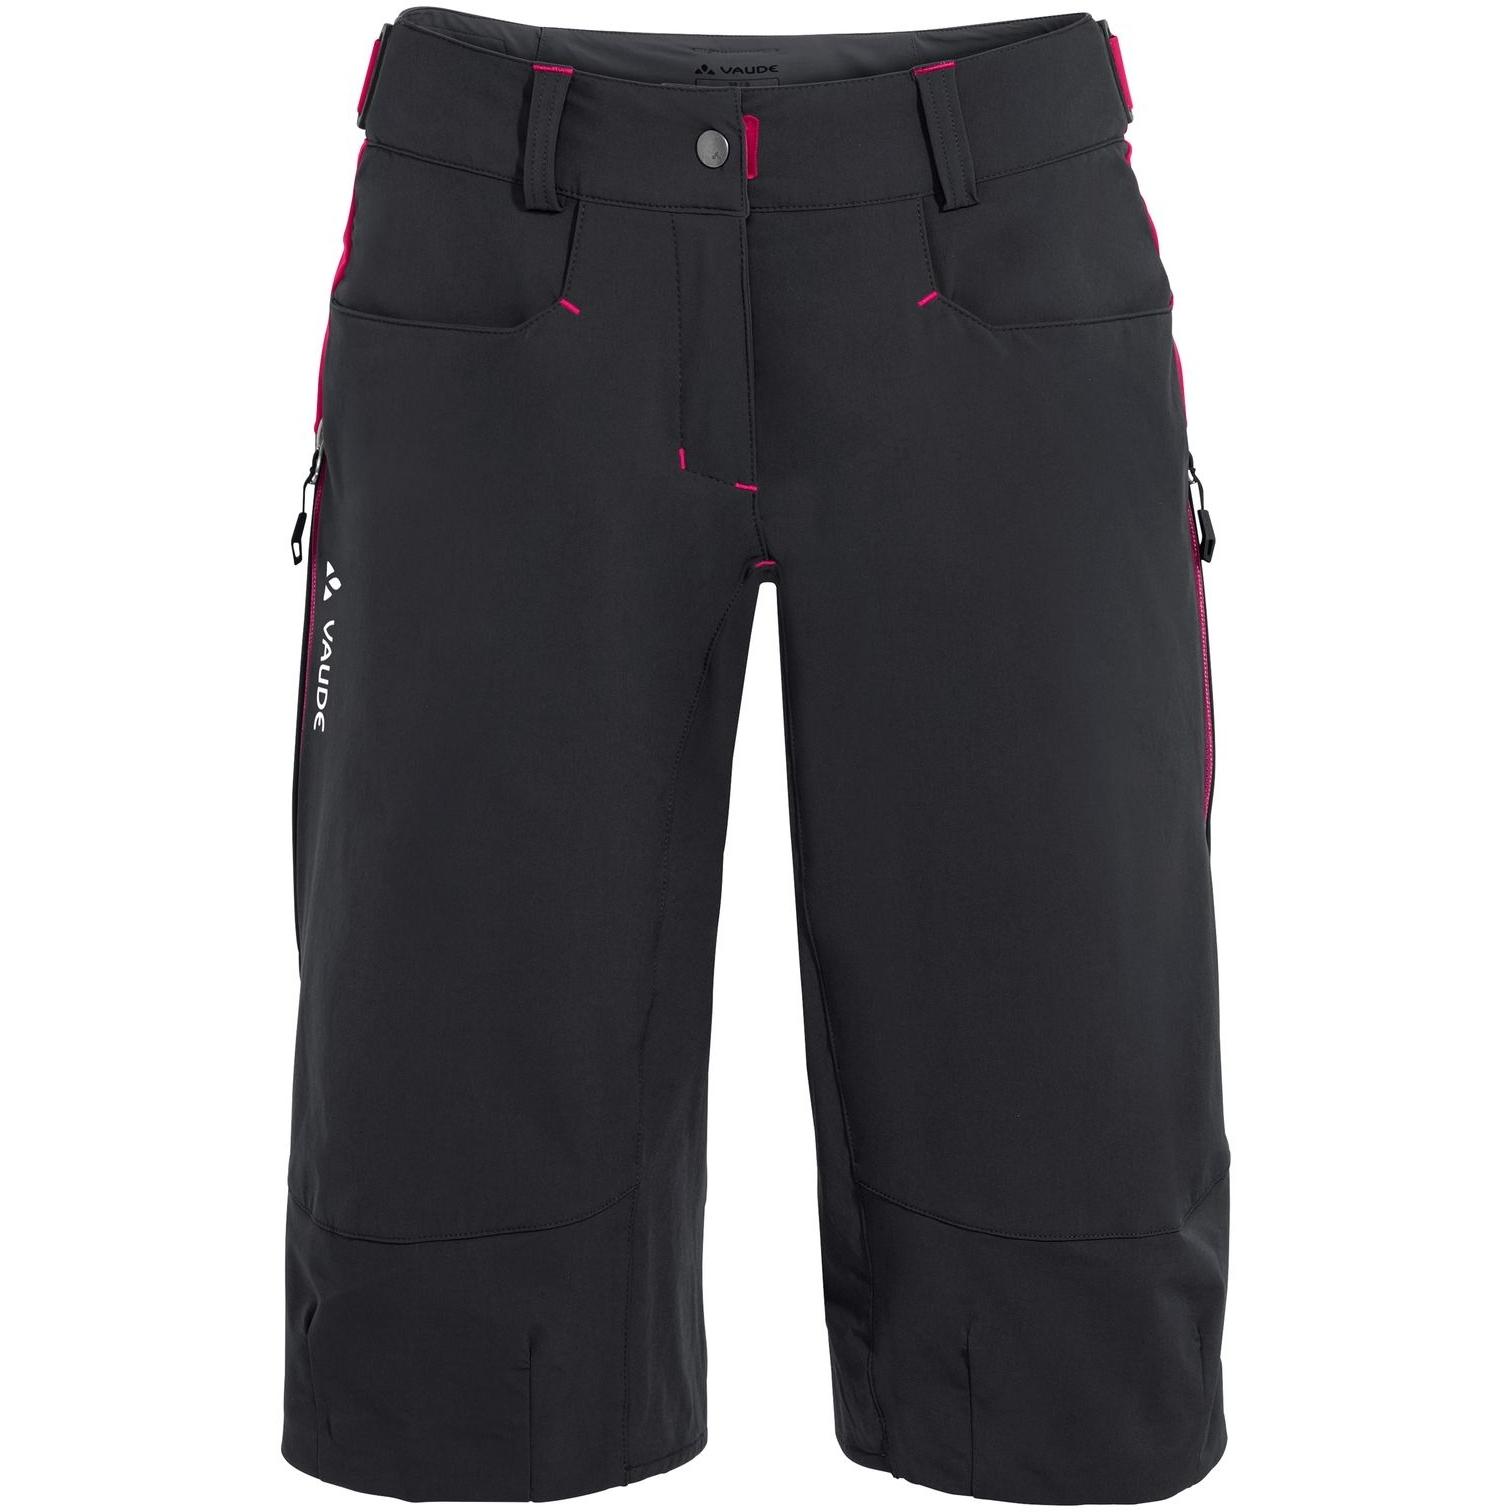 Vaude Moab IV Damen-Shorts - black